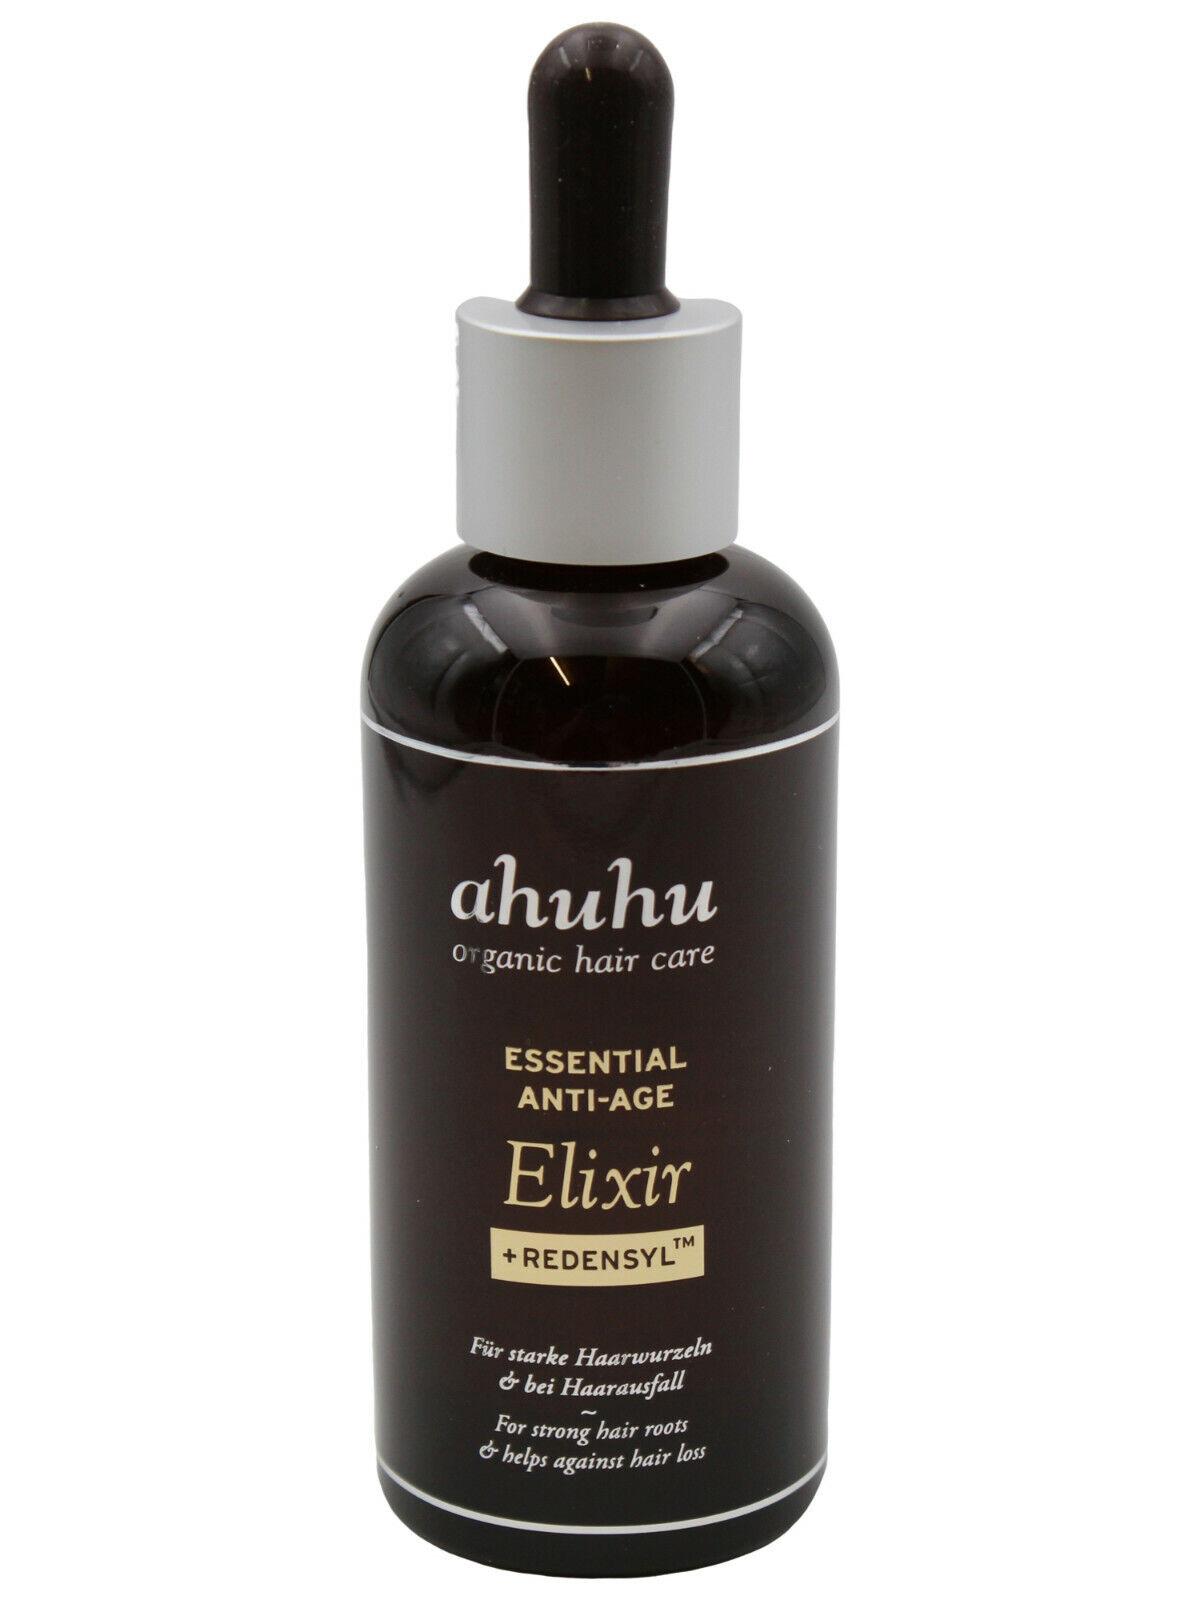 ahuhu organic hair care Essential AntiAge Elixir mit